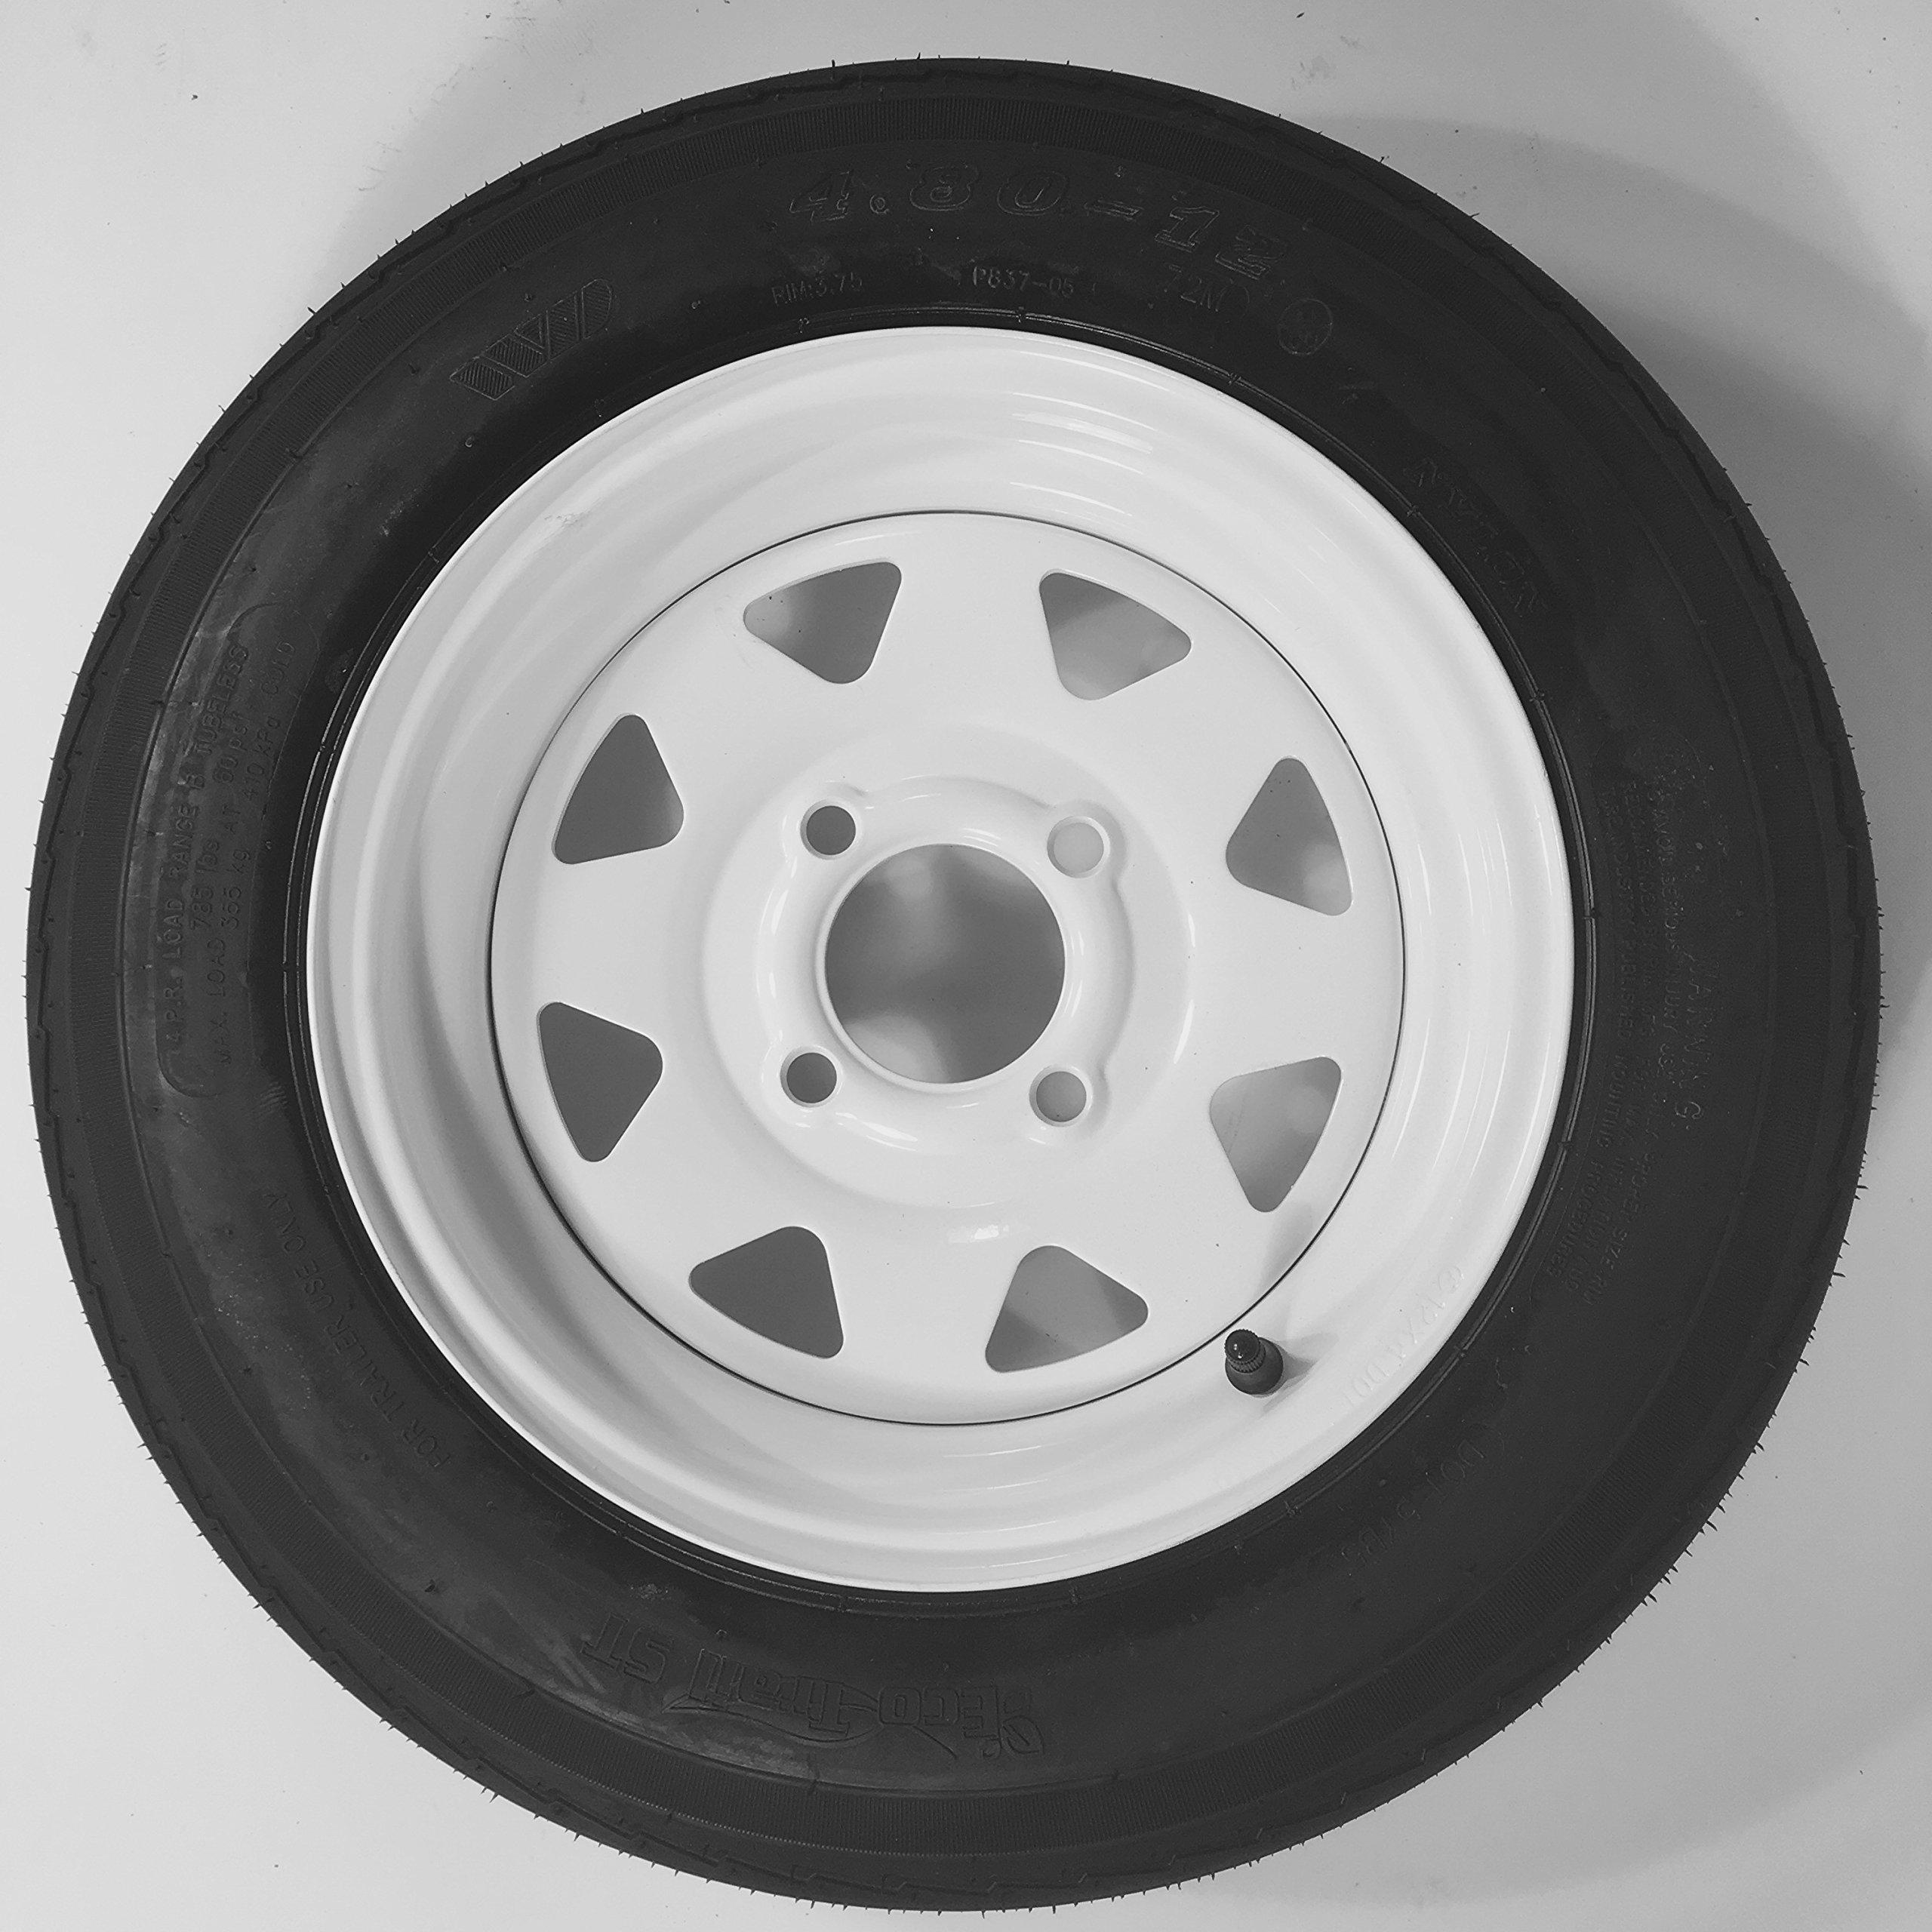 eCustomRim Trailer Tire + Rim 4.80-12 480-12 4.80 X 12 12'' LRB 4 Lug White Wheel Spoke by eCustomRim (Image #1)